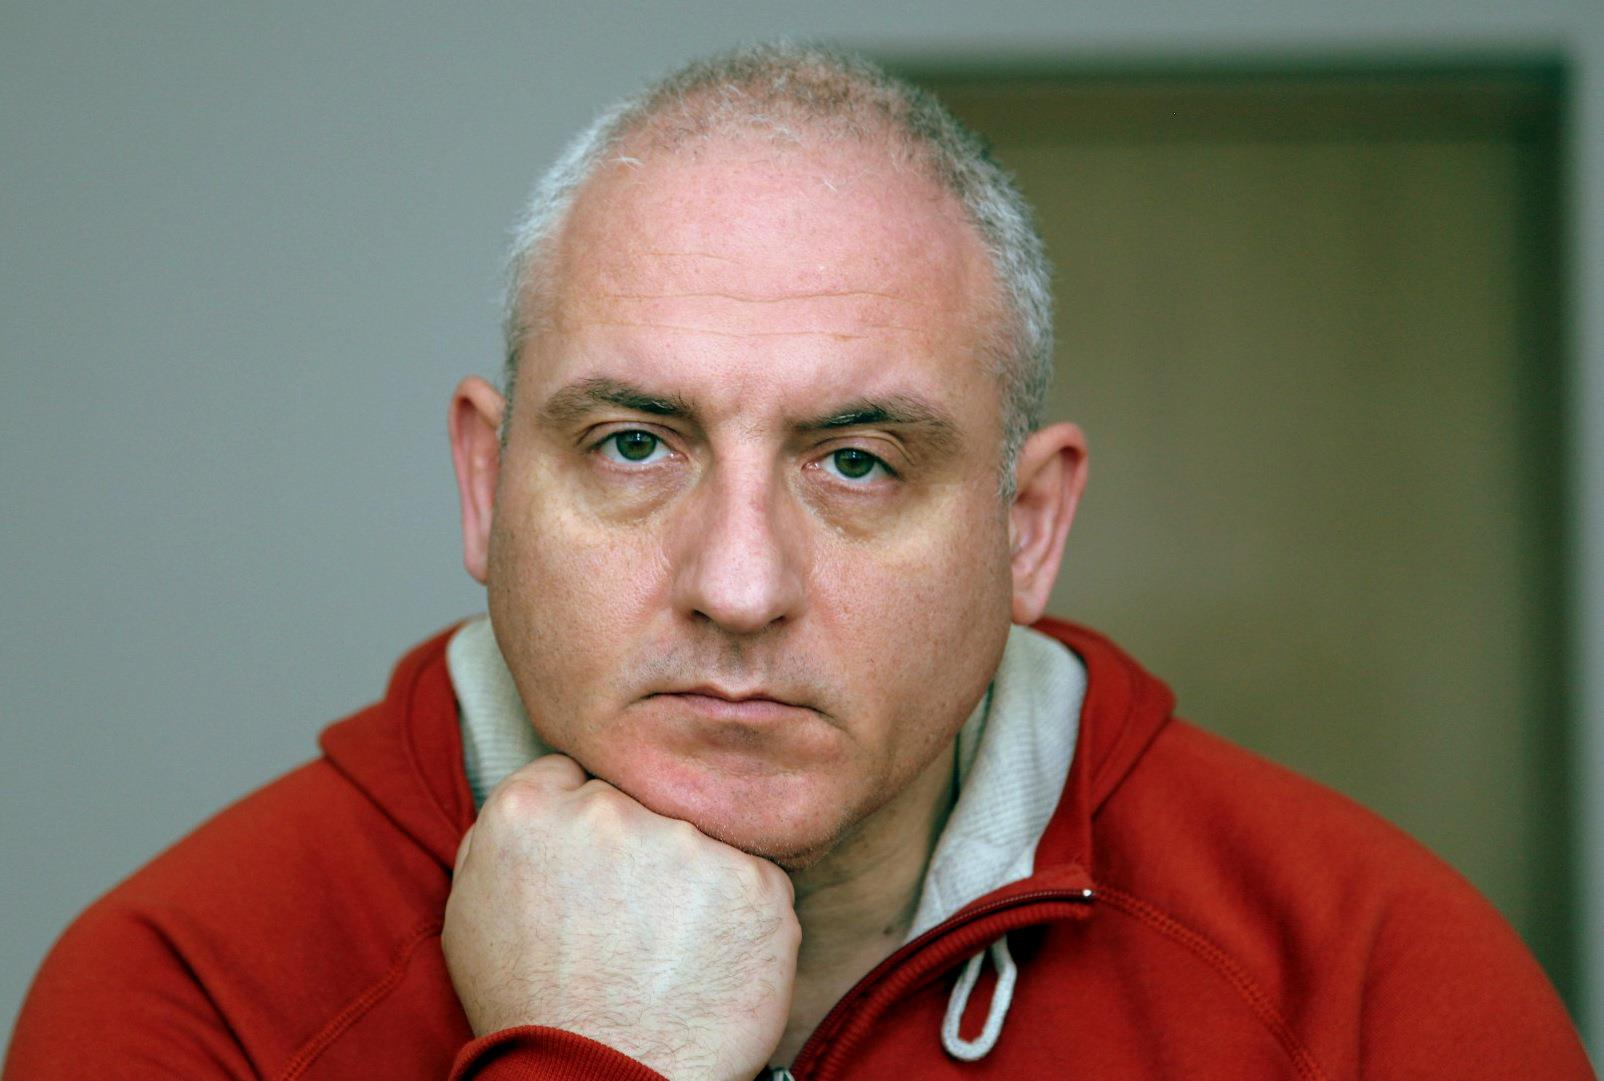 Виктор Мартиросян, новеллист, филолог, лит. редактор TheNorDar